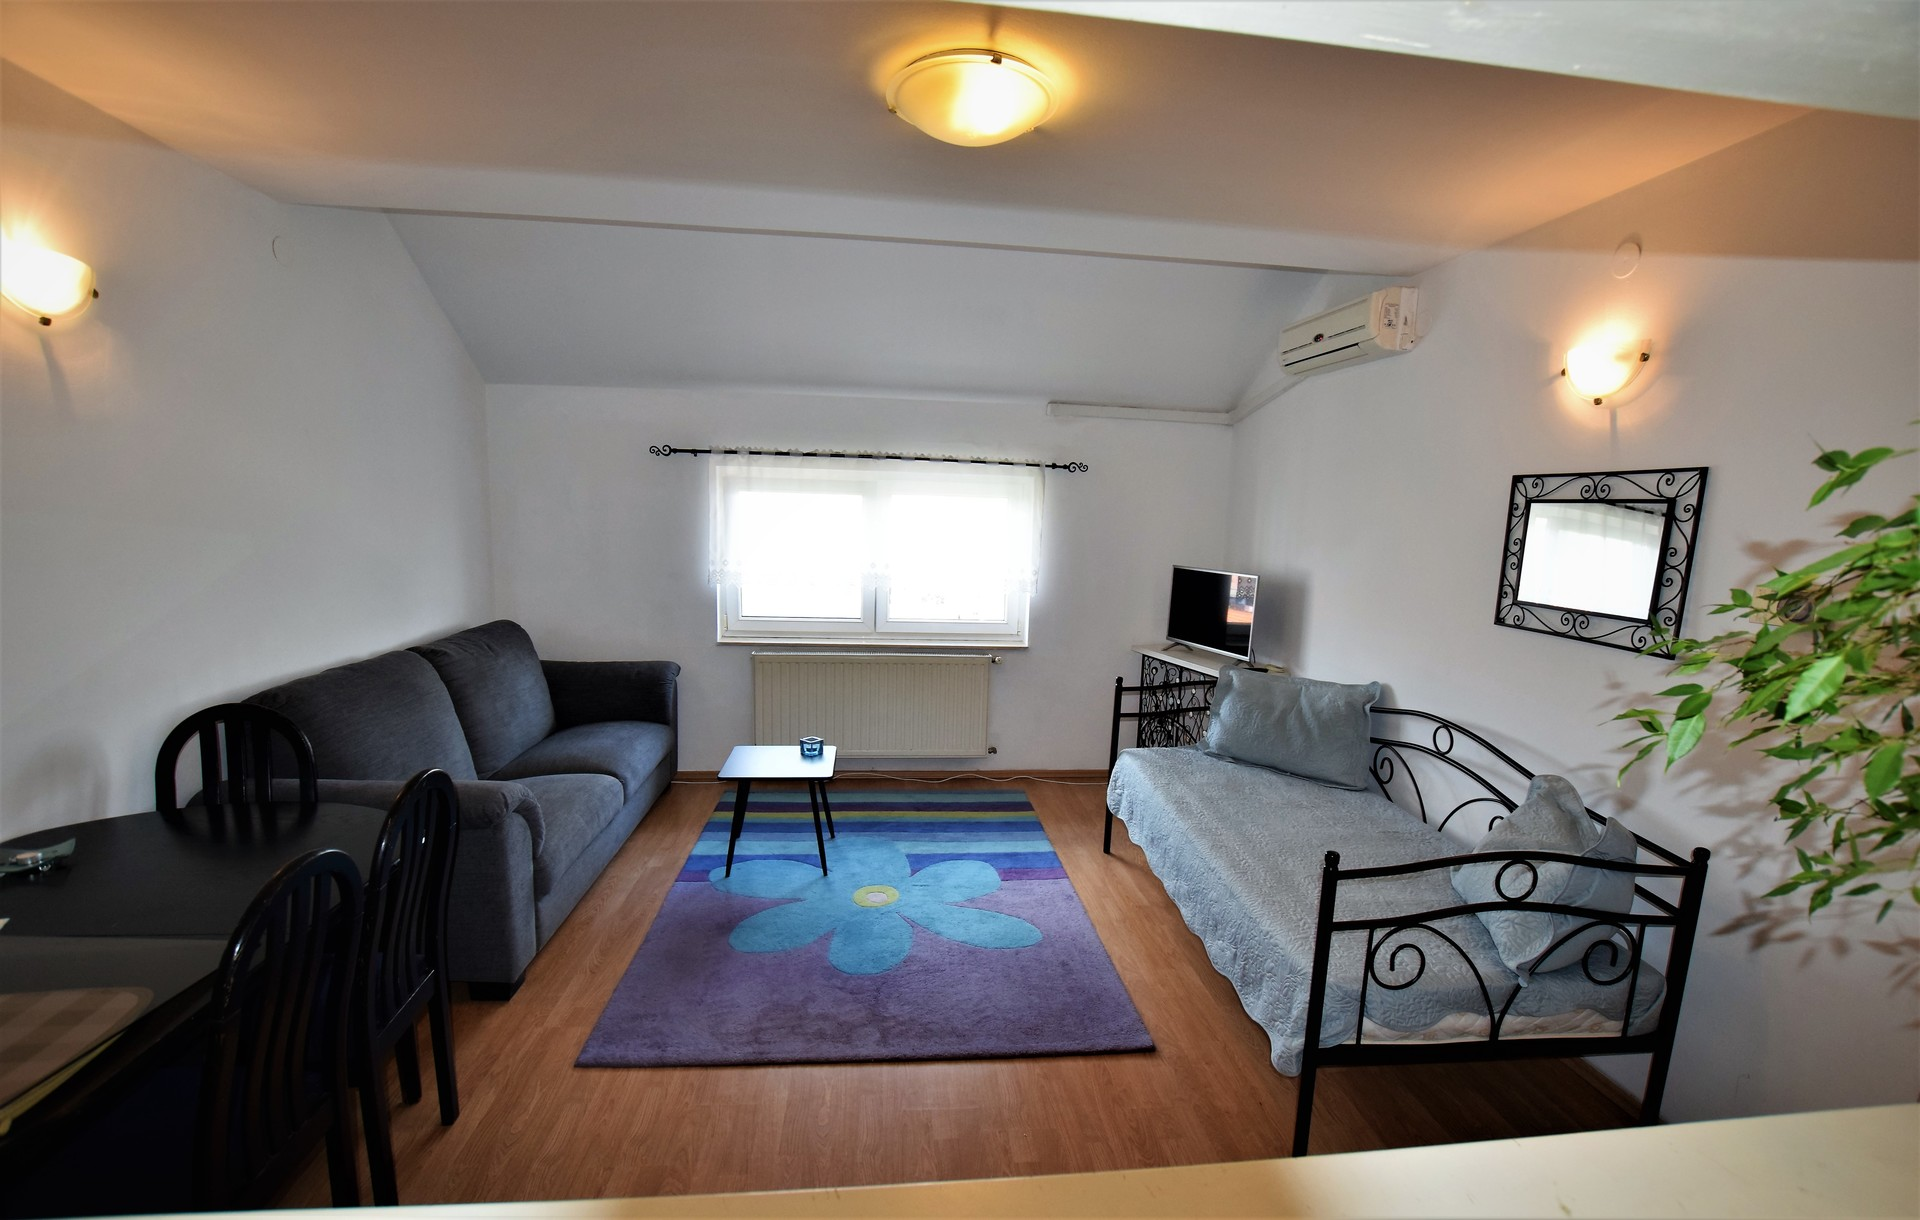 apartment-2-people-62ed26a15f0e35686a4ace8a5a2d64f3